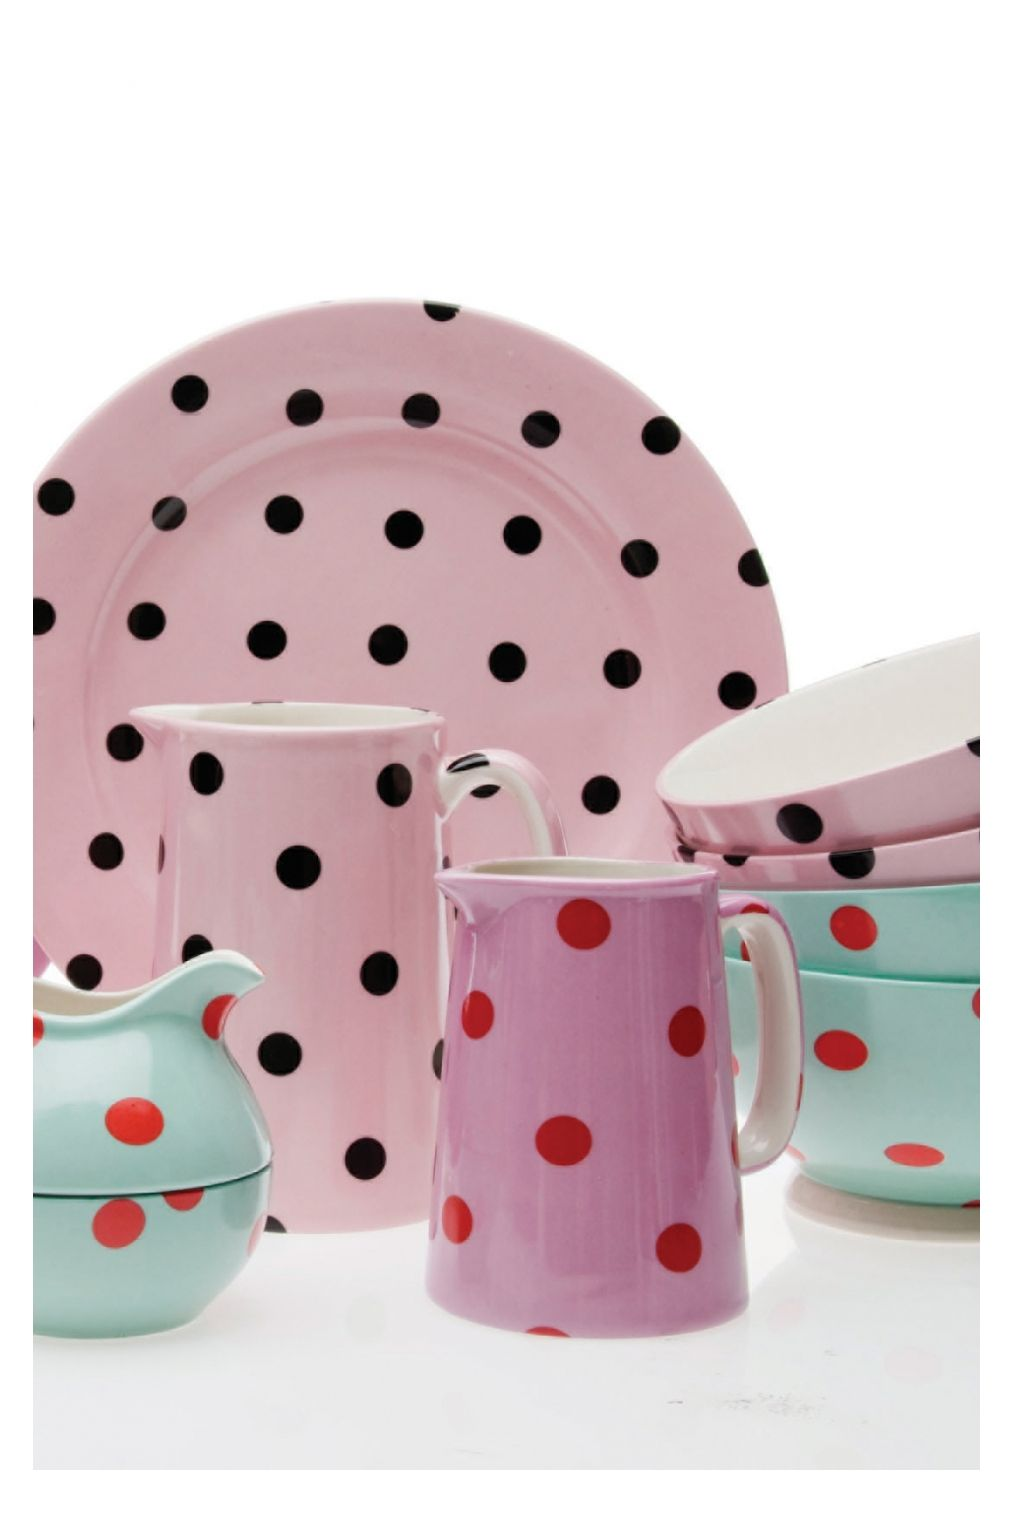 Spotty Dishes Polka Dot Dishes Polka Dot Plate Polka Dots